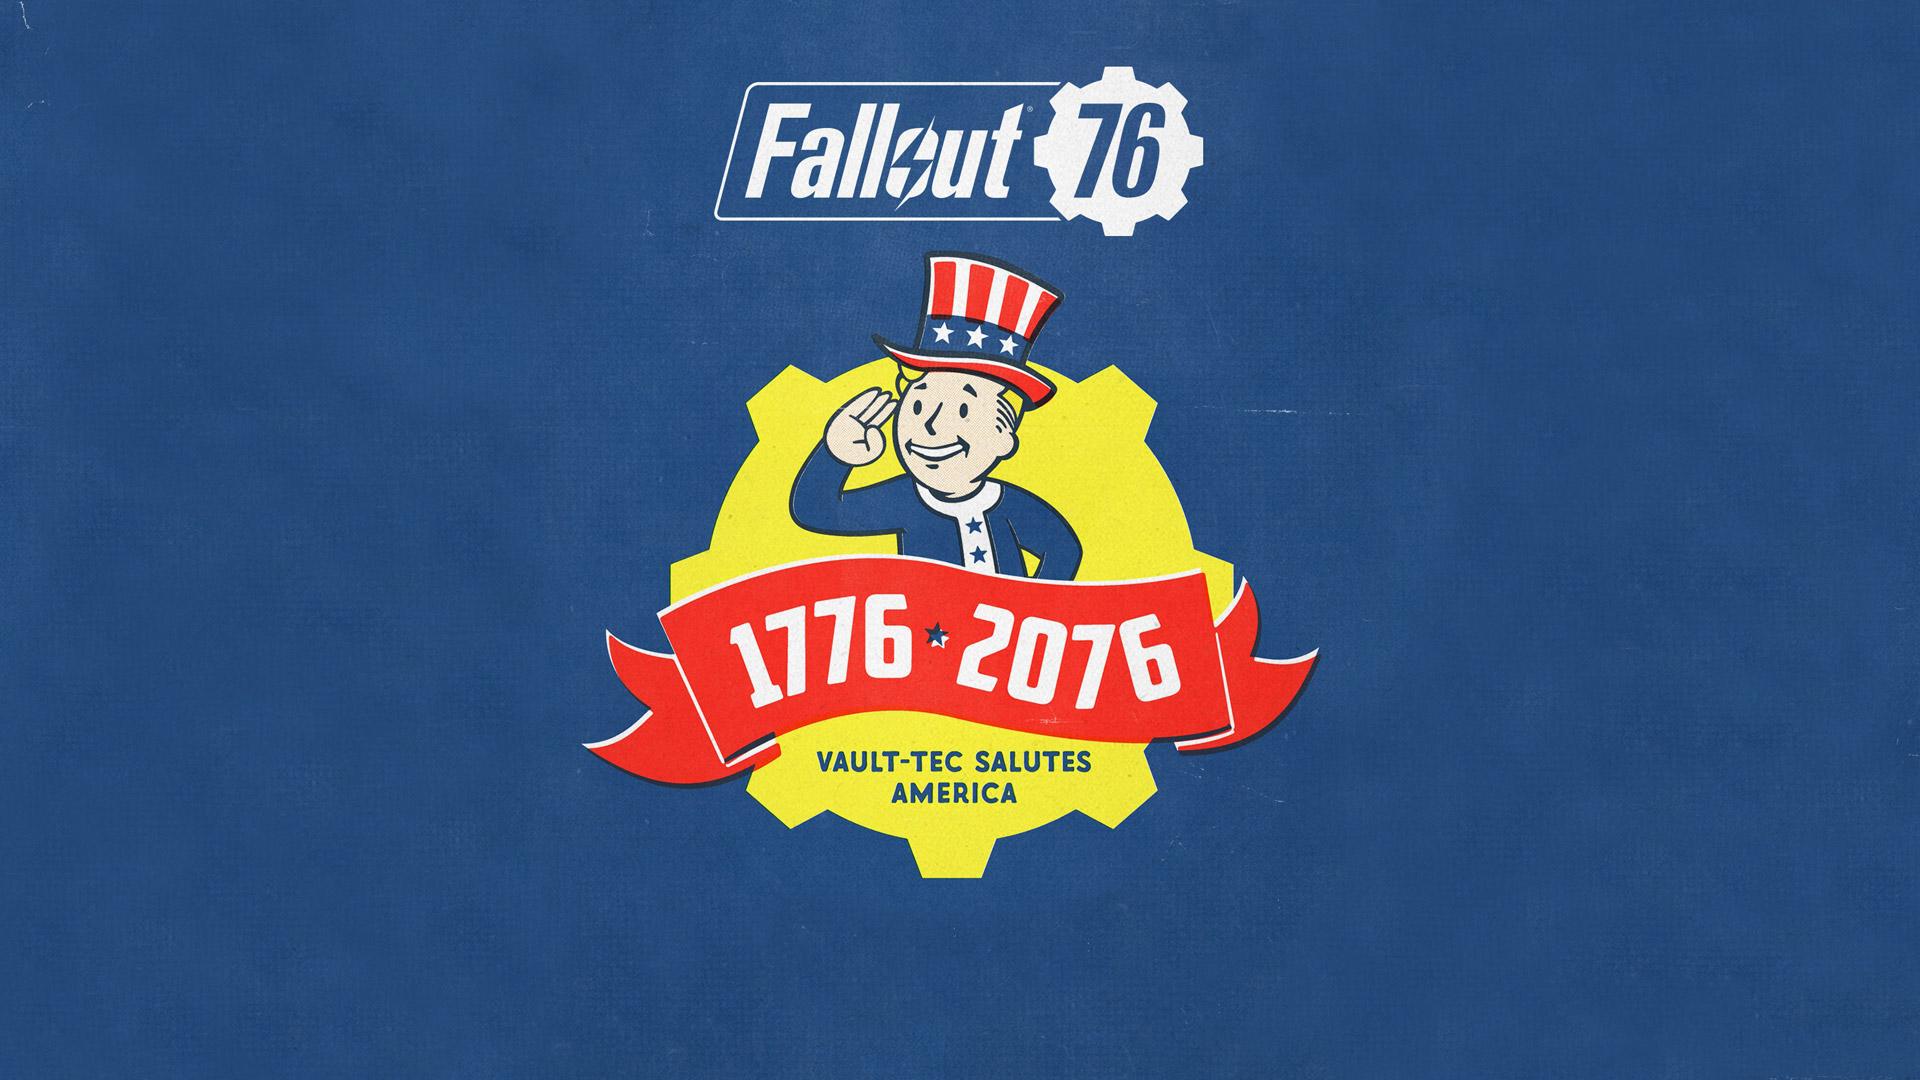 Free Fallout 76 Wallpaper in 1920x1080